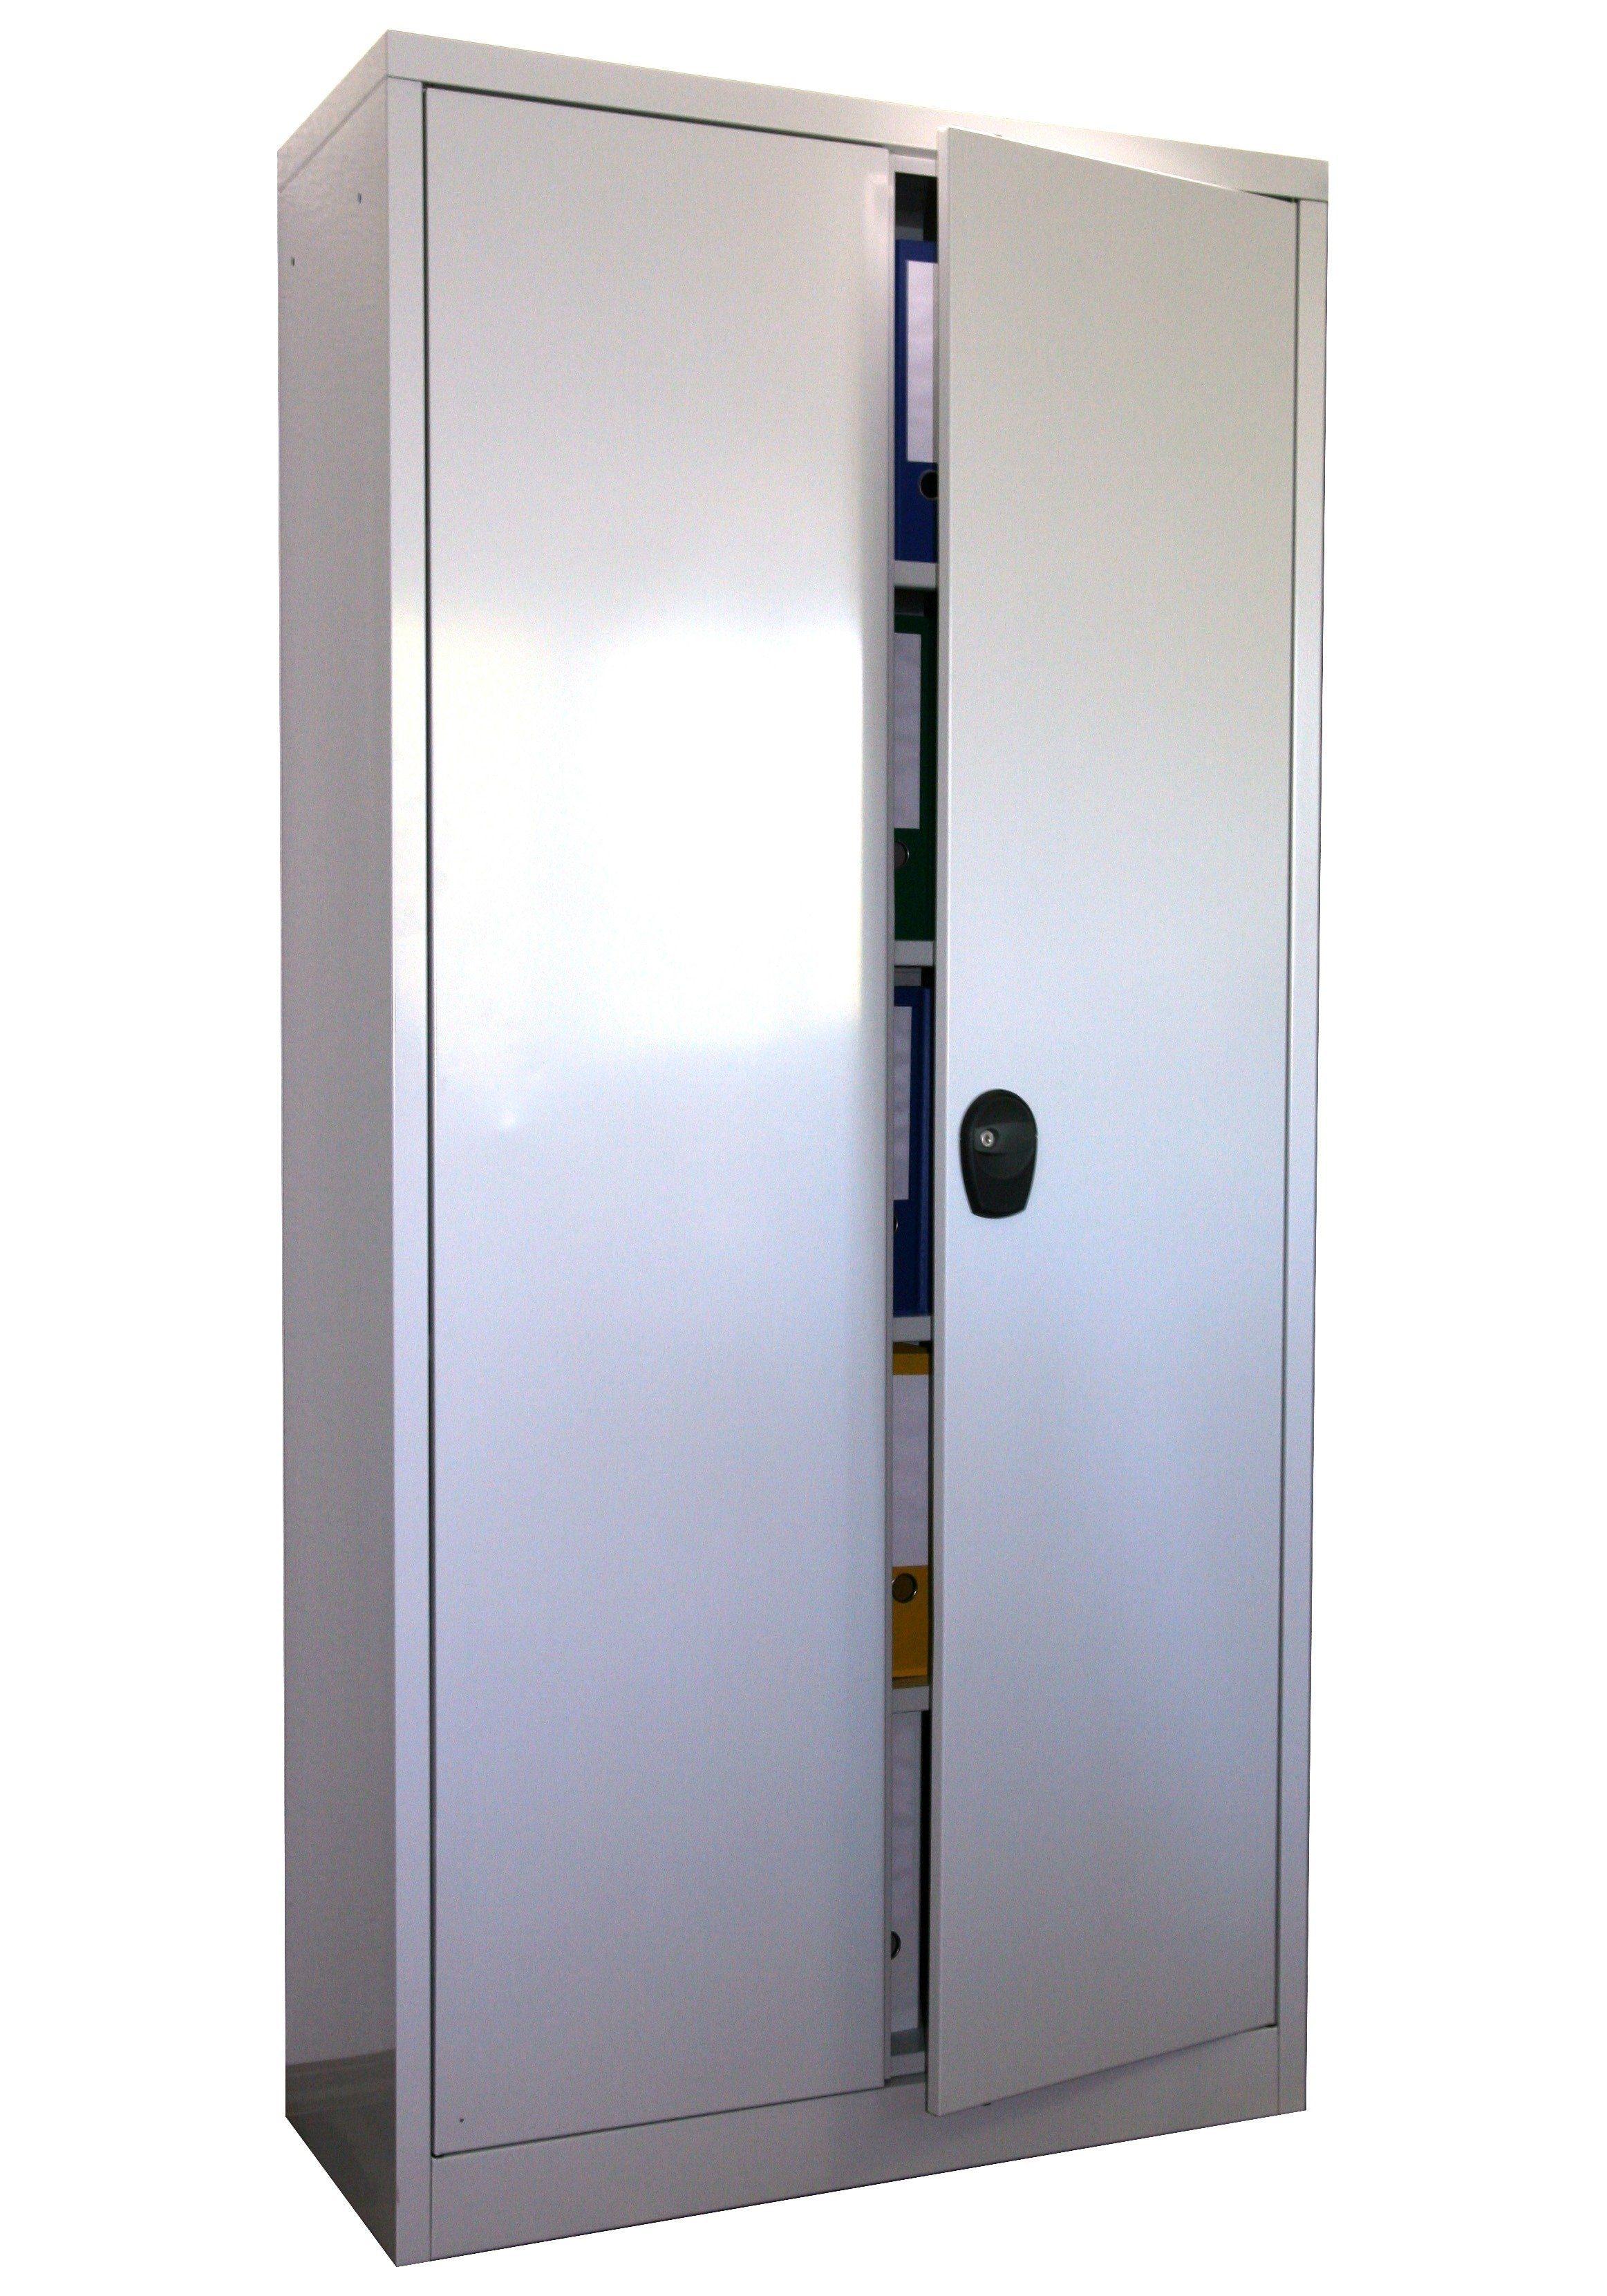 Sz Metall Stahlschrank 180 x 80, grau